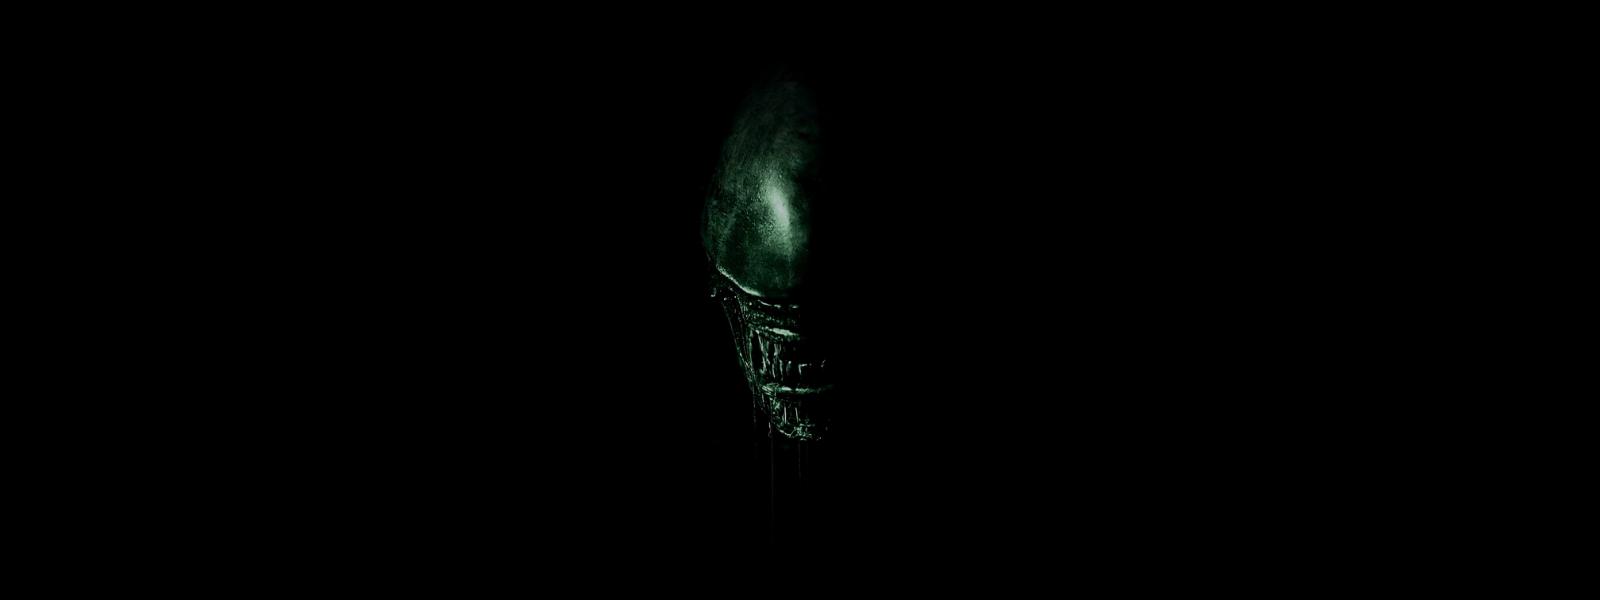 cosmic horror movies - alien; covenant cover art